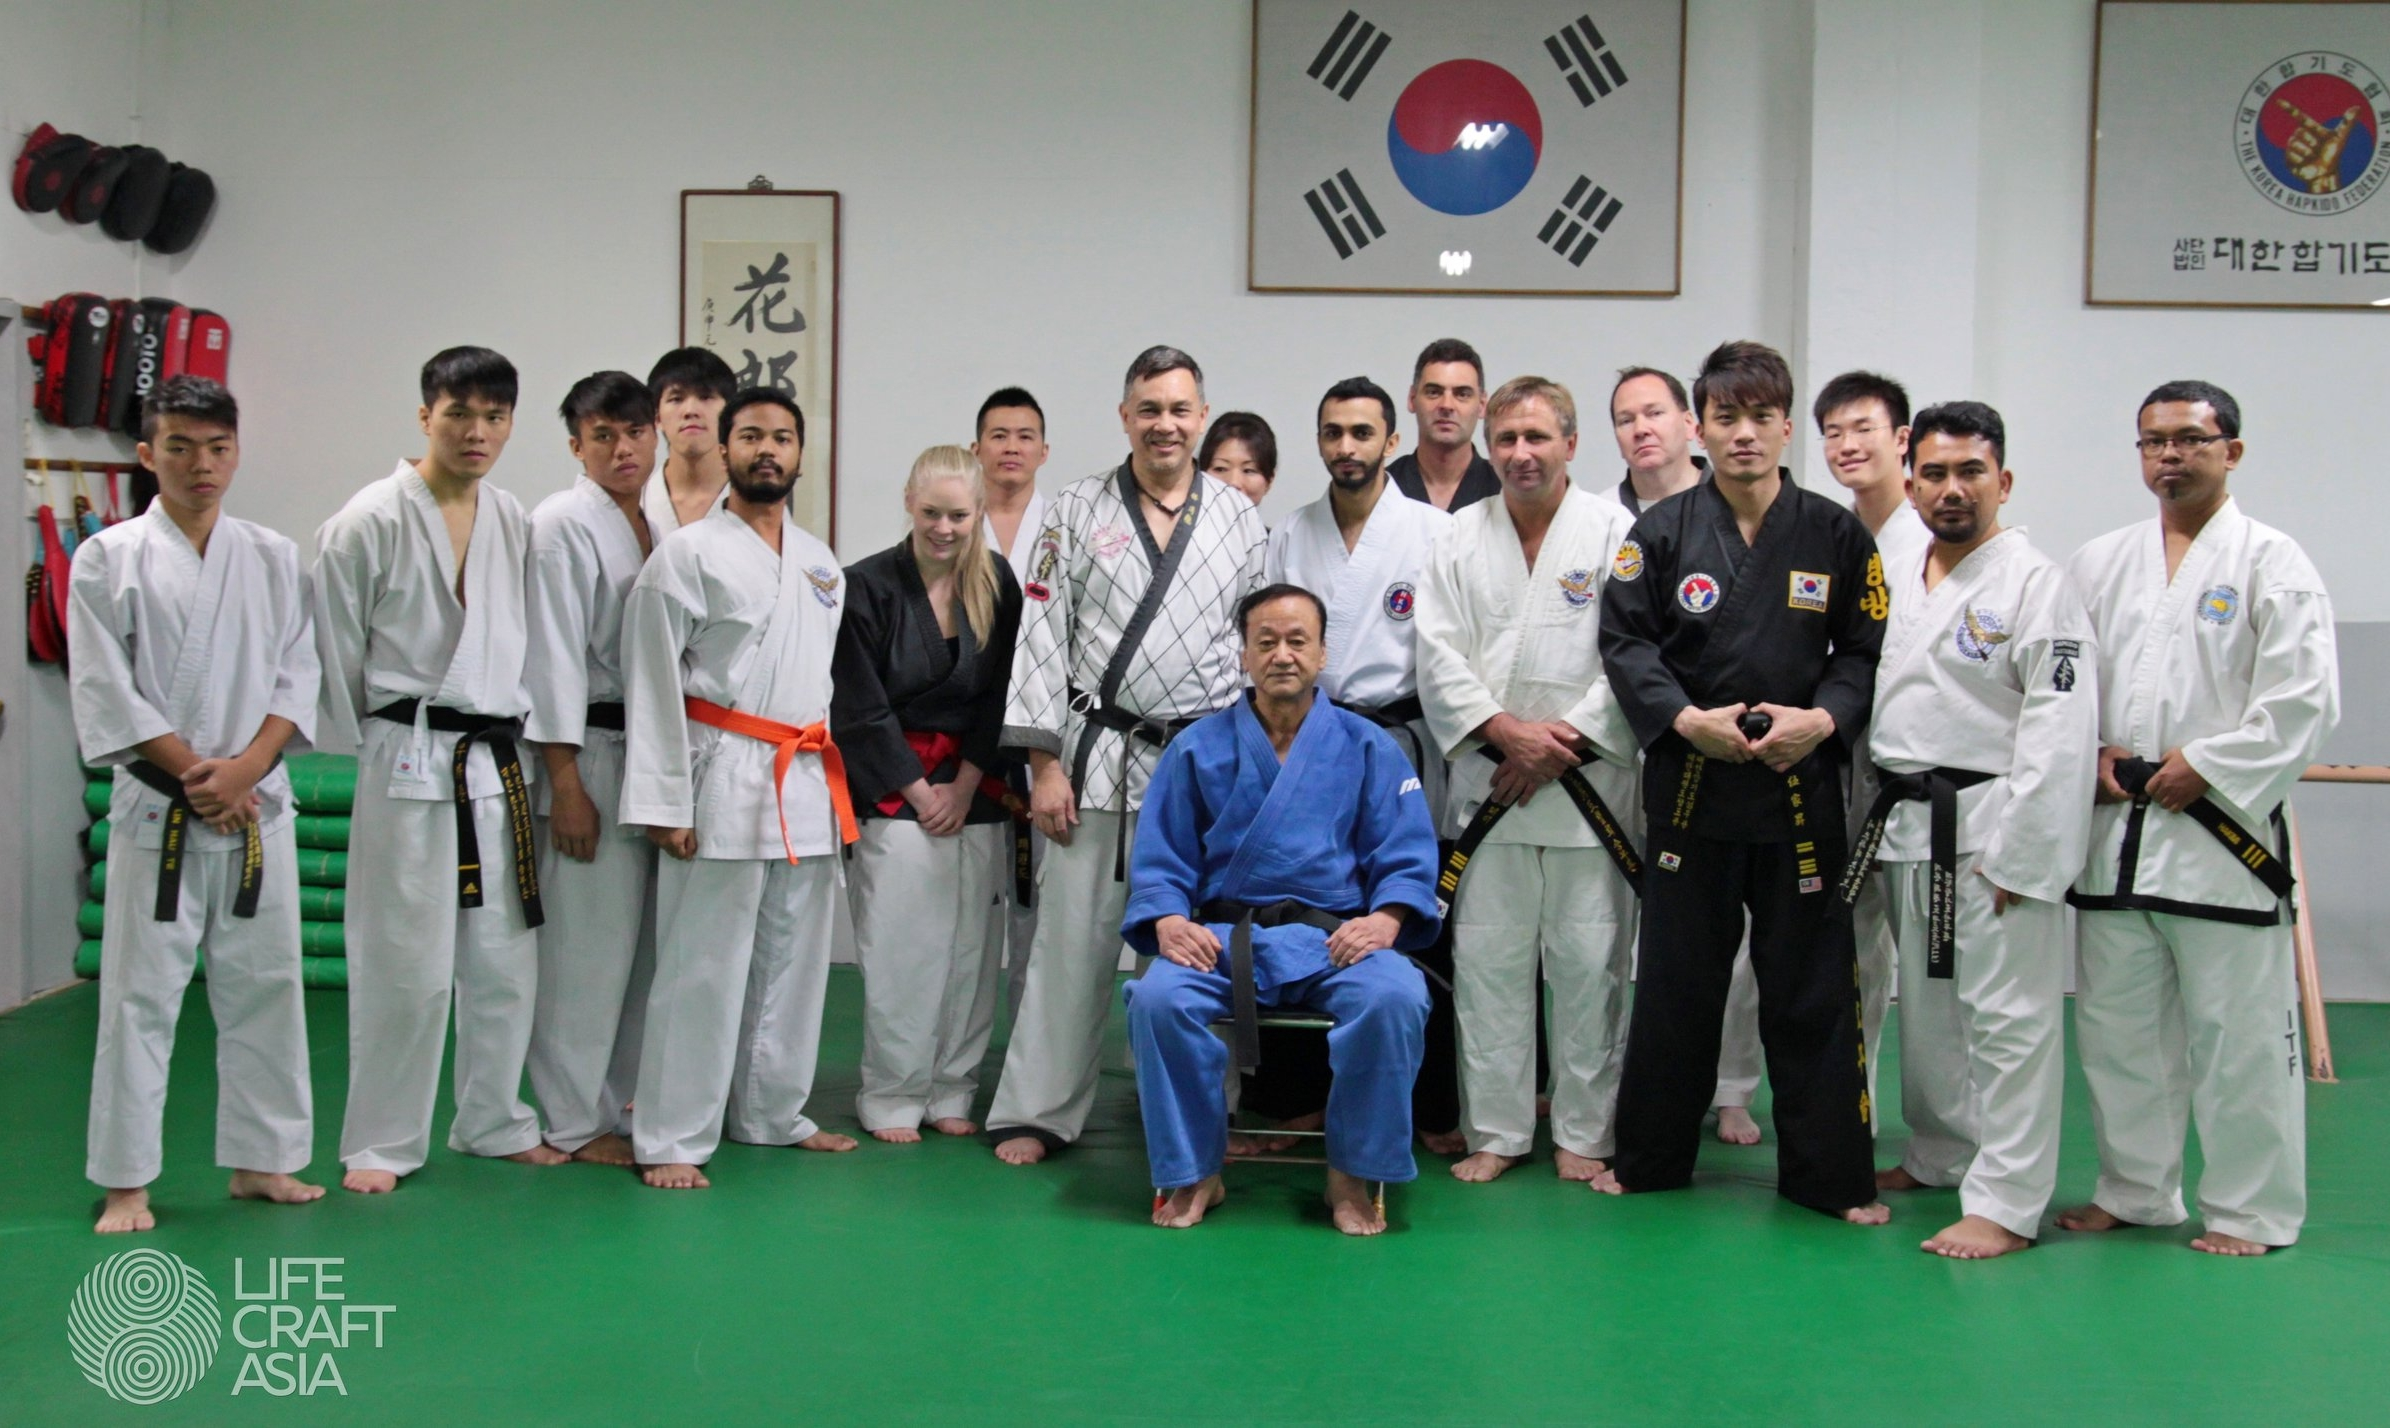 LifeCraft Asia trainers with Grand Master Kim Nam Jae and Grand Master Julian Lim